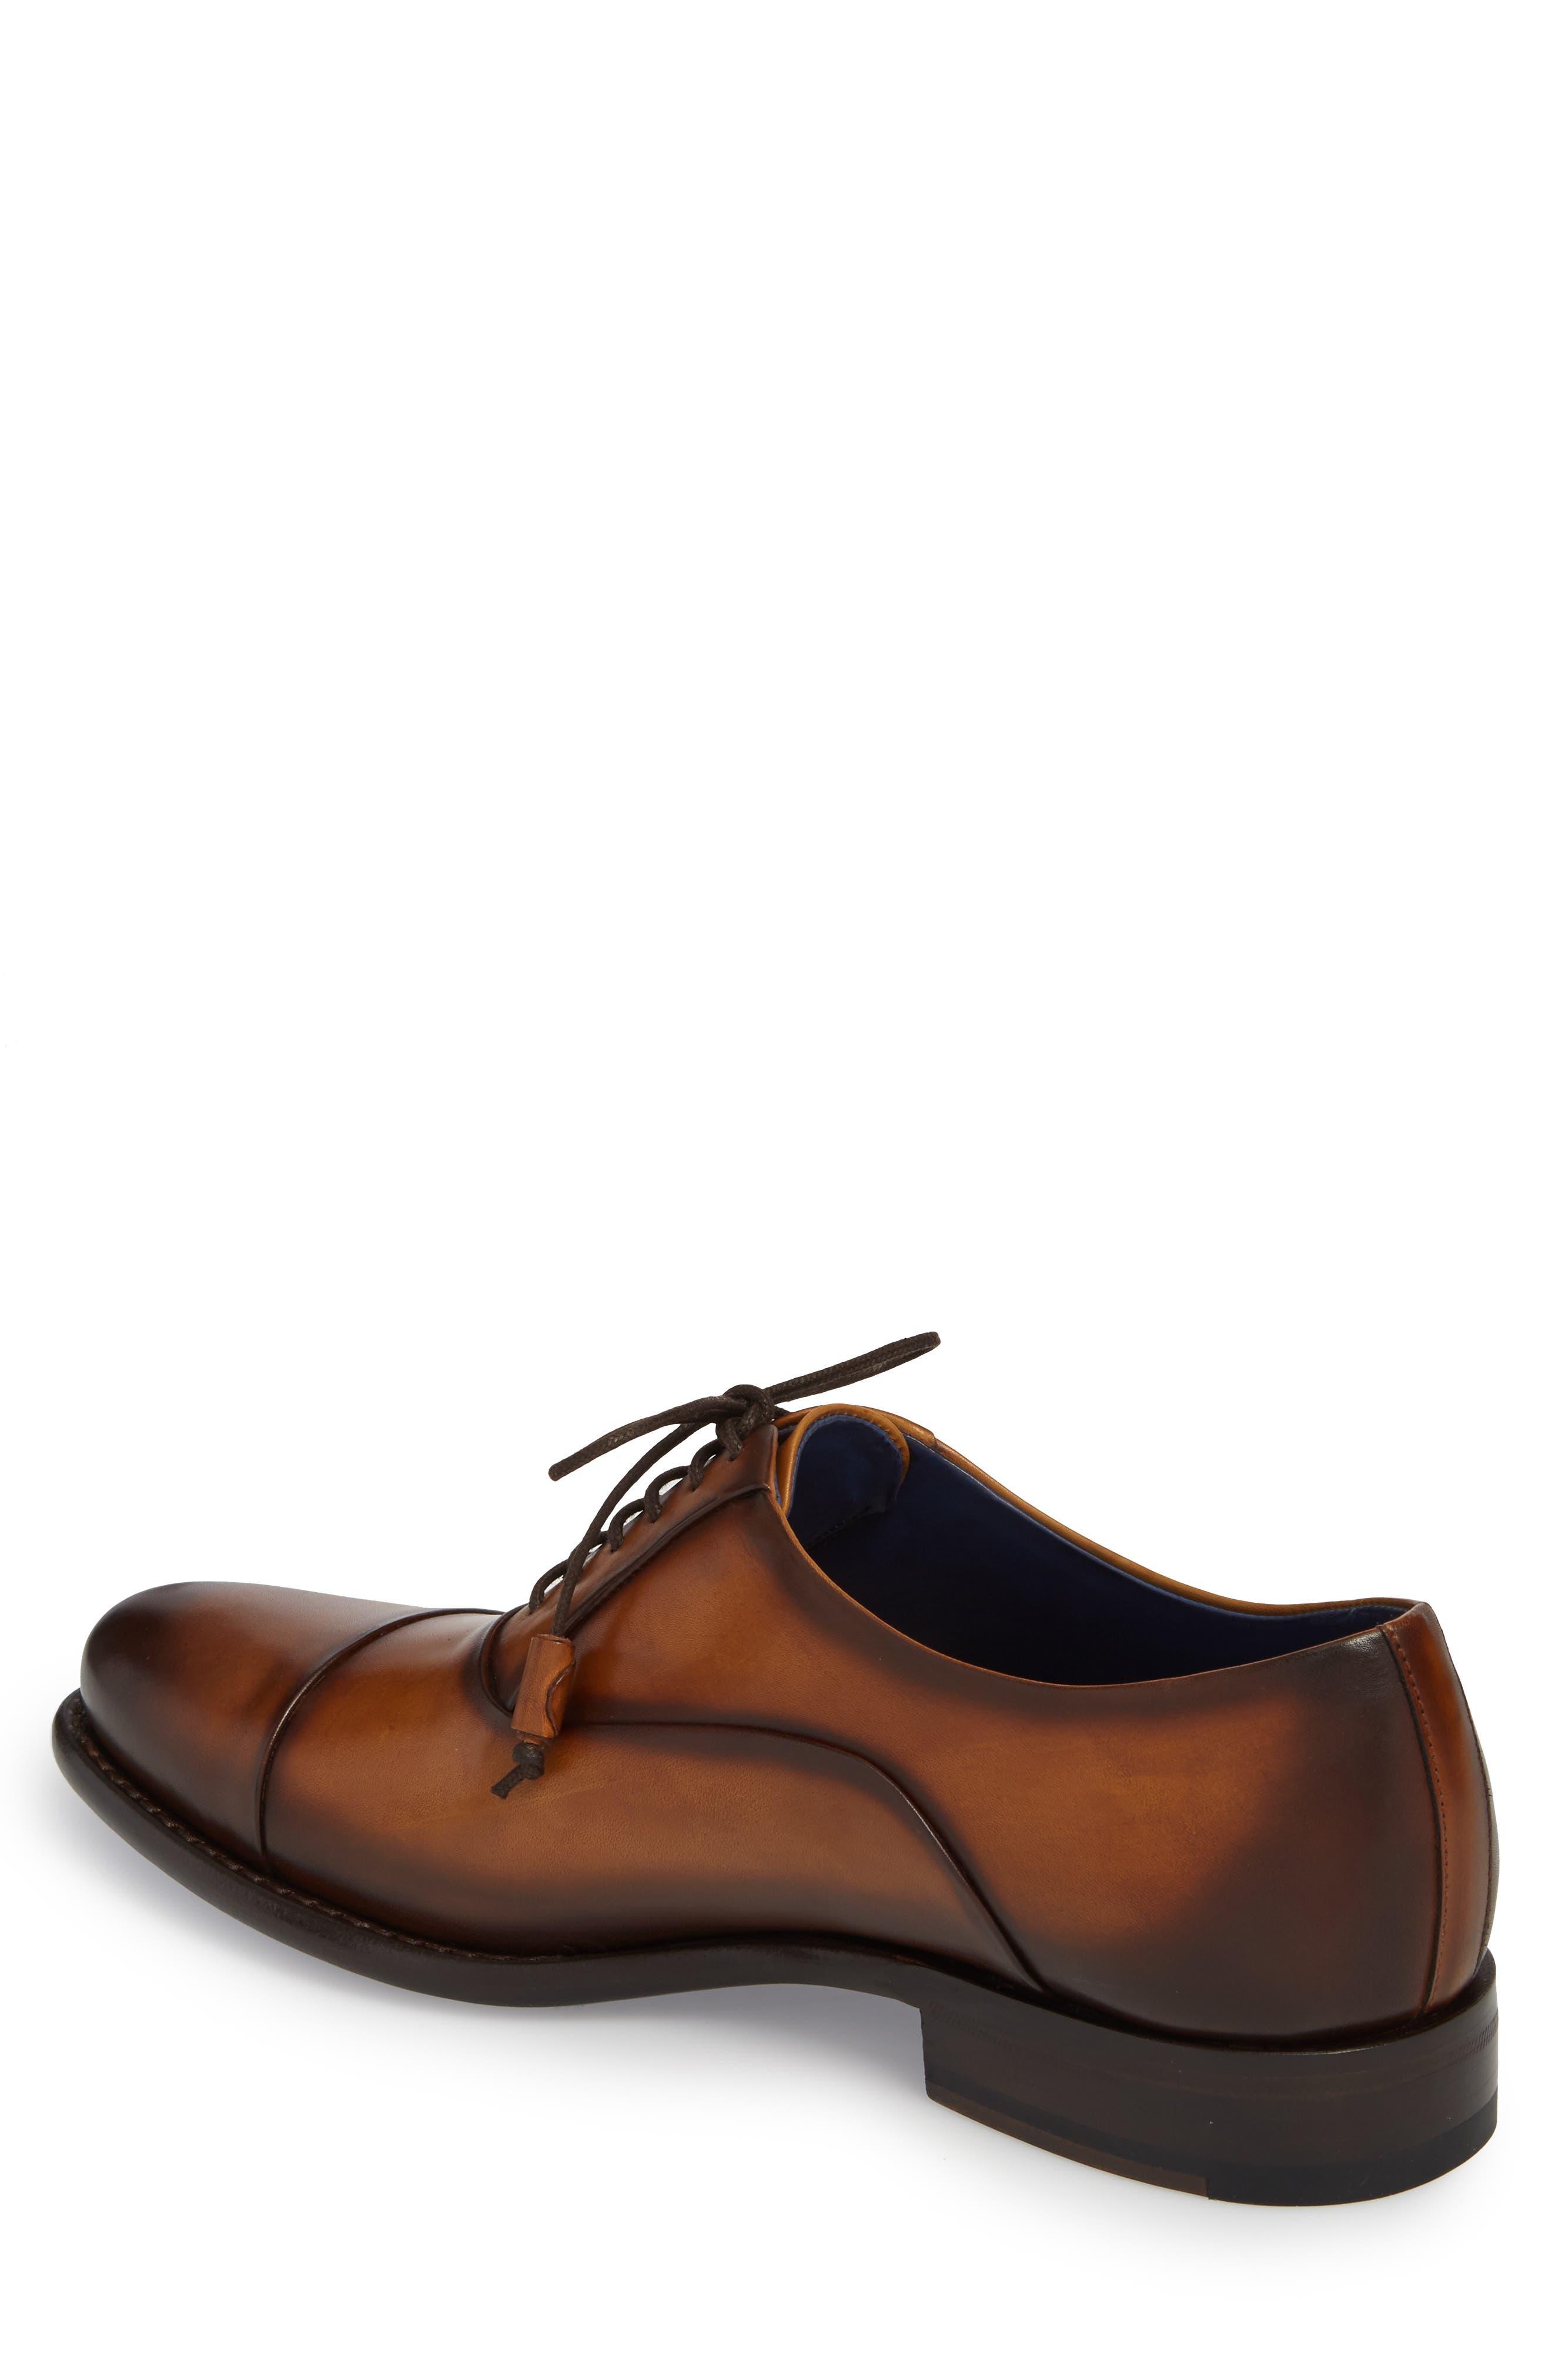 Helios Cap Toe Oxford,                             Alternate thumbnail 2, color,                             Honey Leather